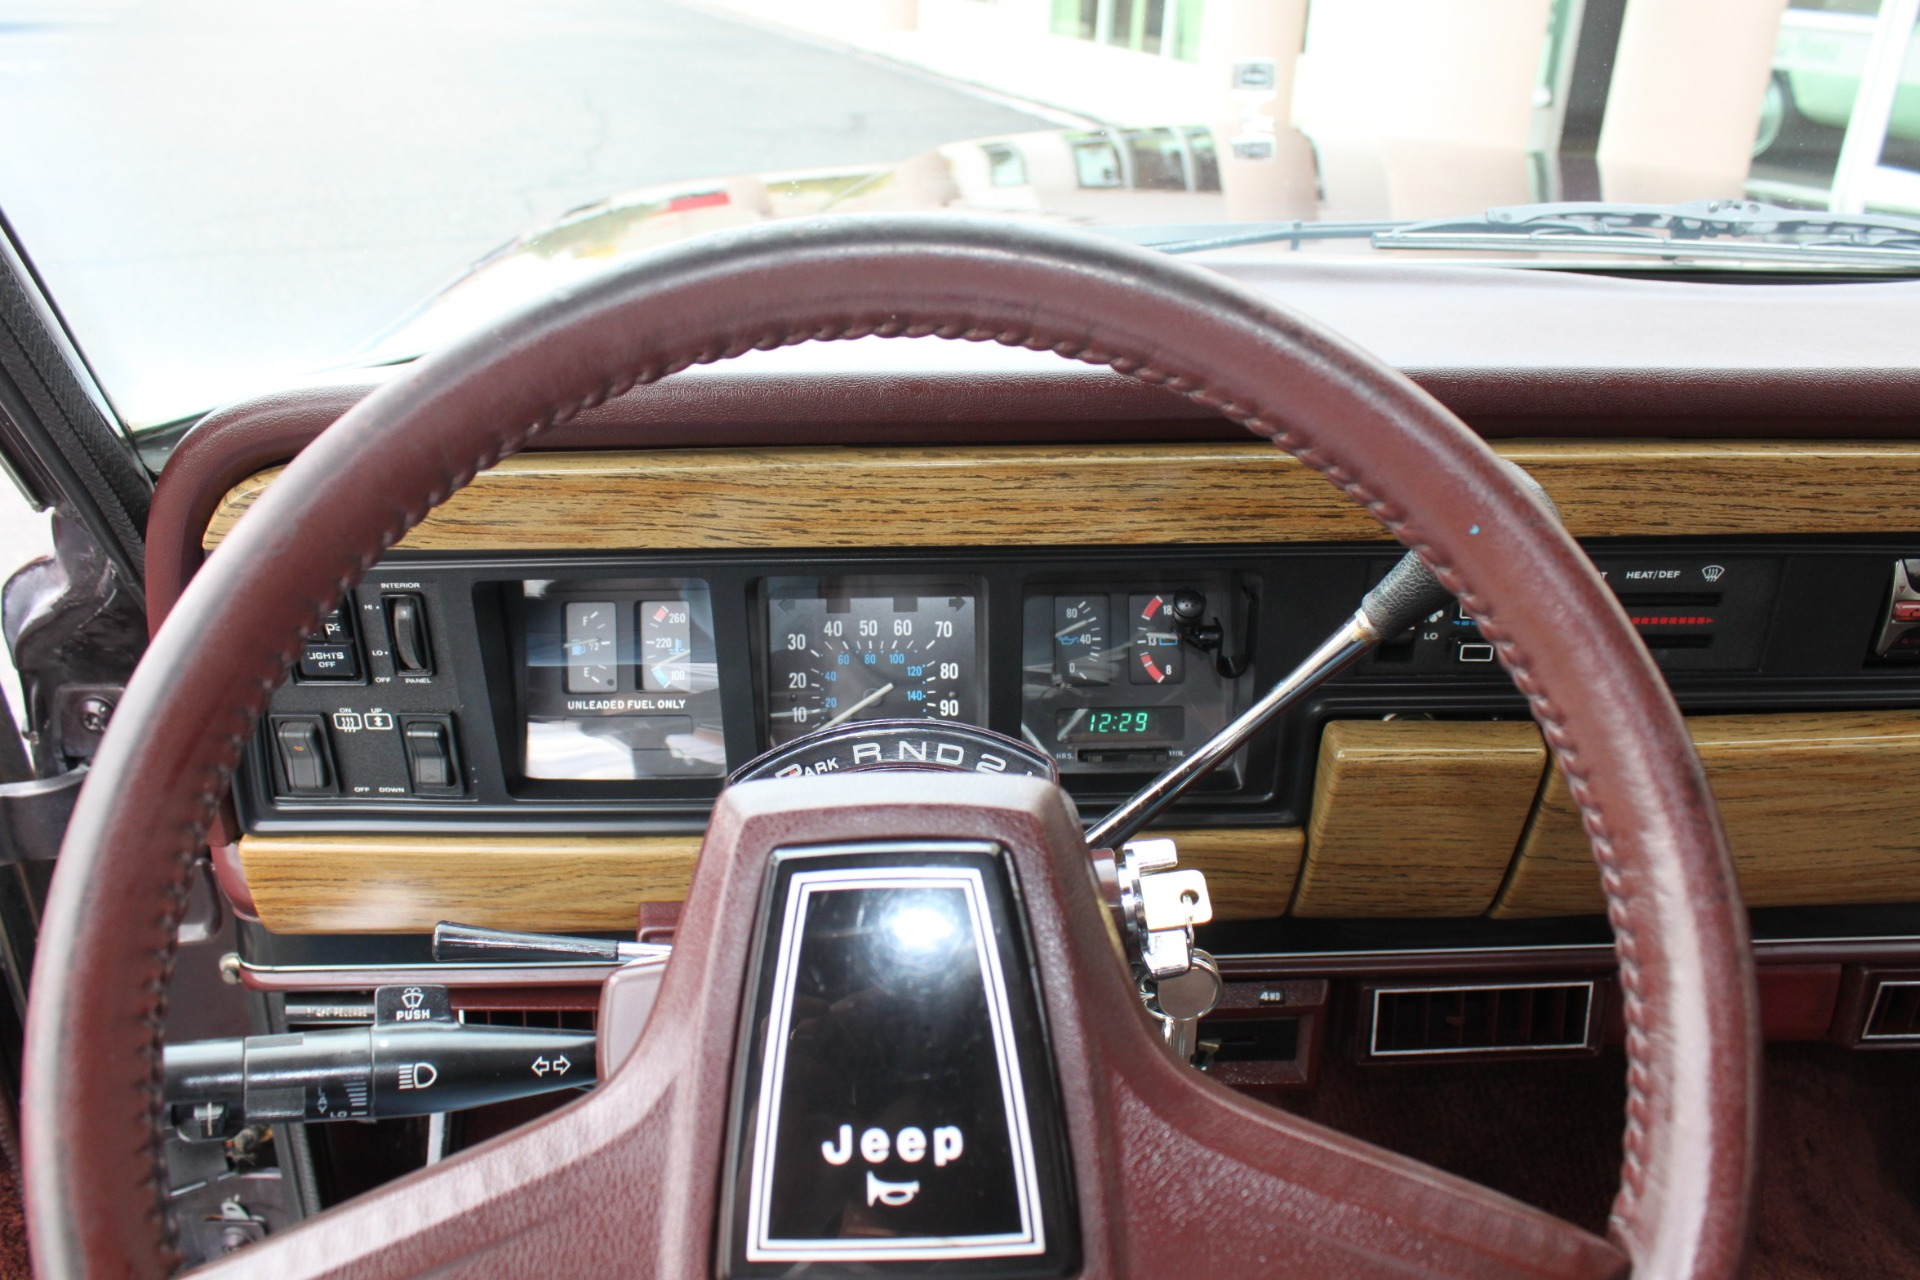 Used-1989-Jeep-Grand-Wagoneer-Tesla